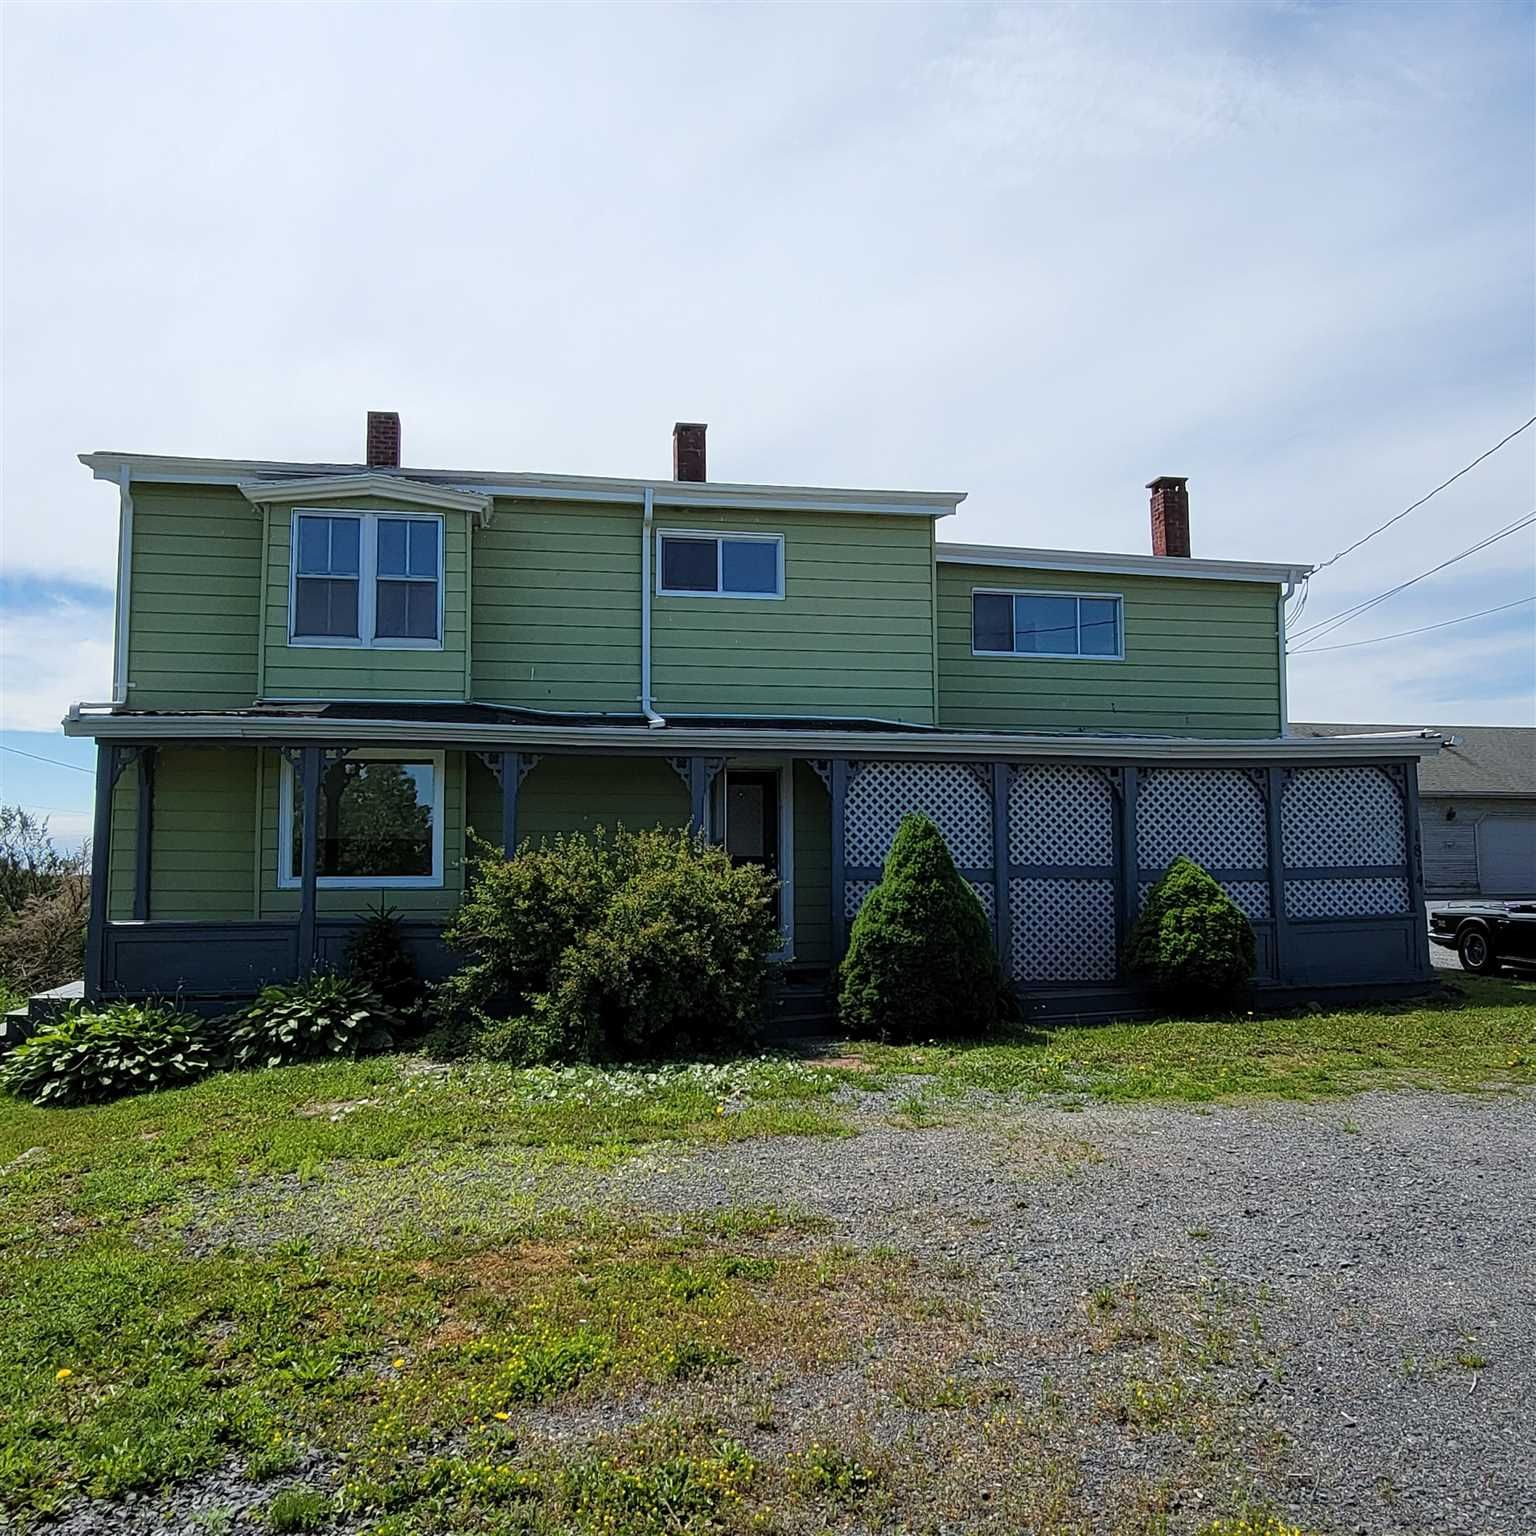 Main Photo: 1814 Hammonds Plains Road in Hammonds Plains: 21-Kingswood, Haliburton Hills, Hammonds Pl. Residential for sale (Halifax-Dartmouth)  : MLS®# 202117883